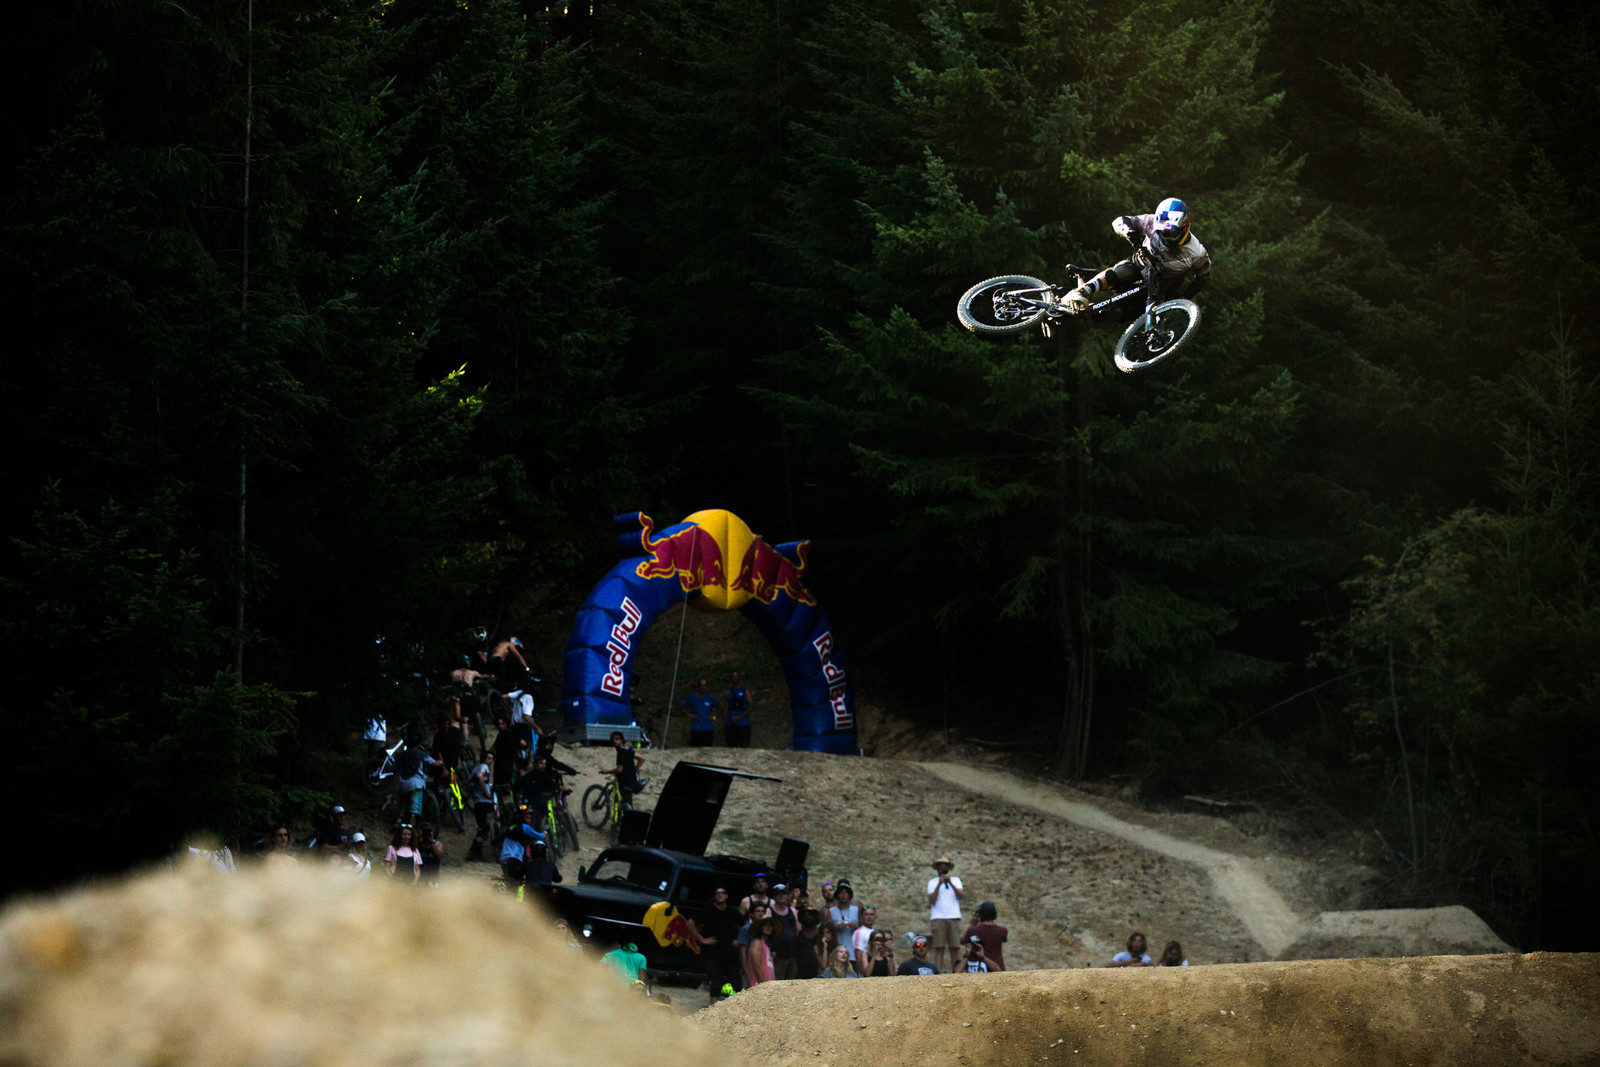 Carson Storch - McGazza Fest Dream Track Jam - Mountain Biking Pictures - Vital MTB